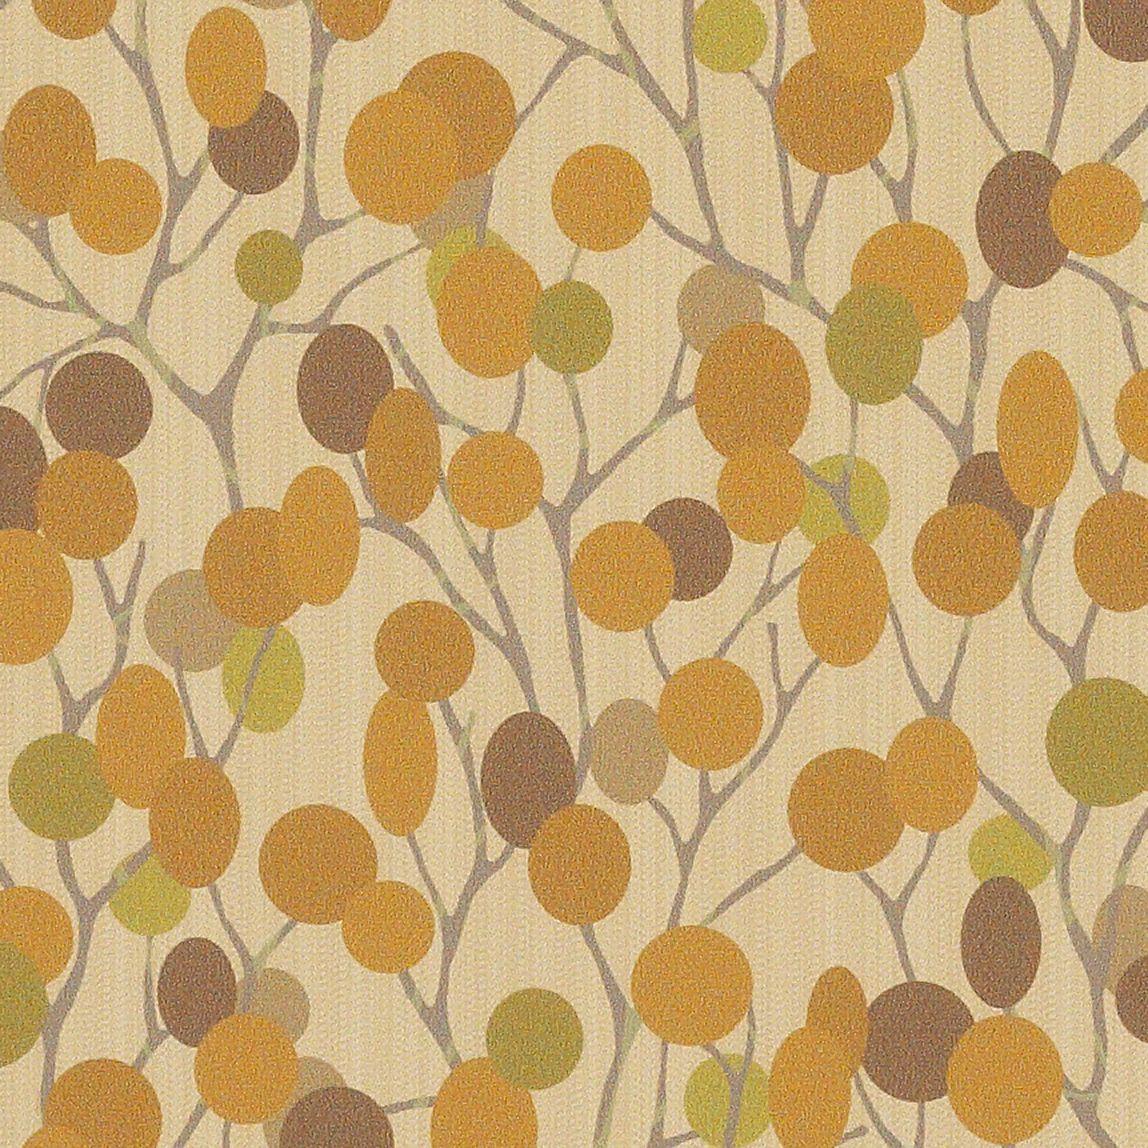 Natural World Marigold Swatch